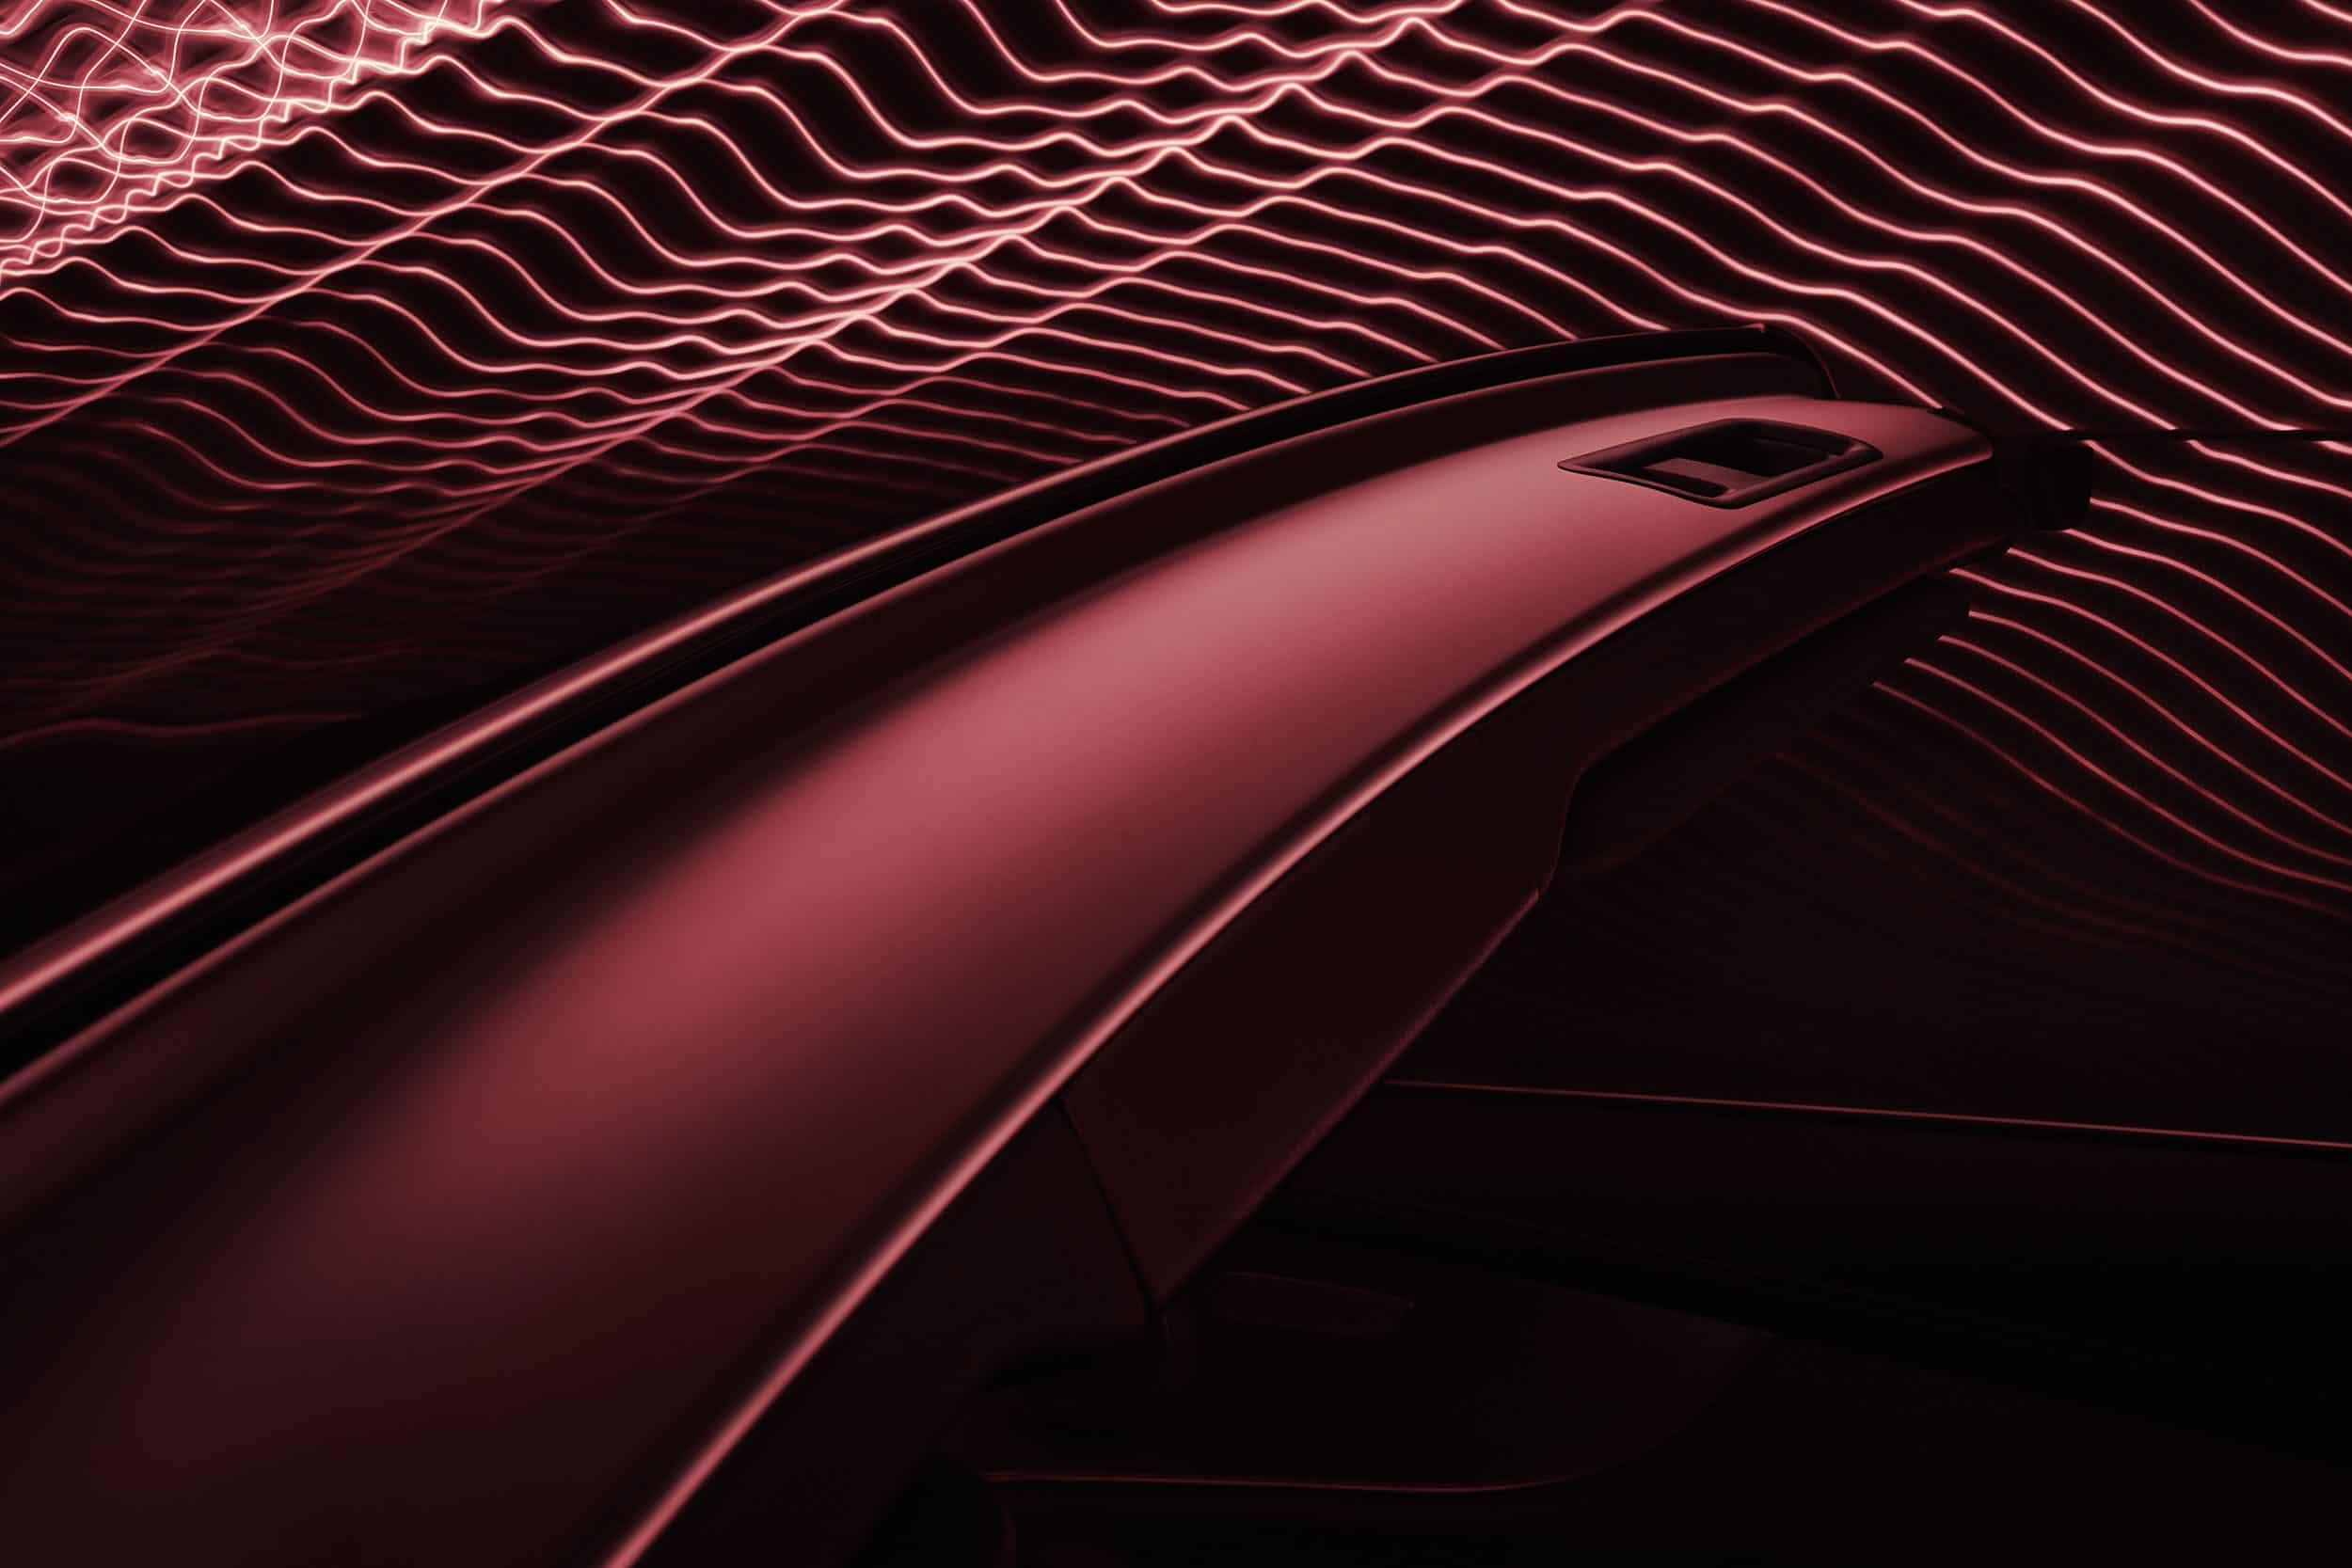 studio-ignatov-wkw-automotive-imagekampagne-07